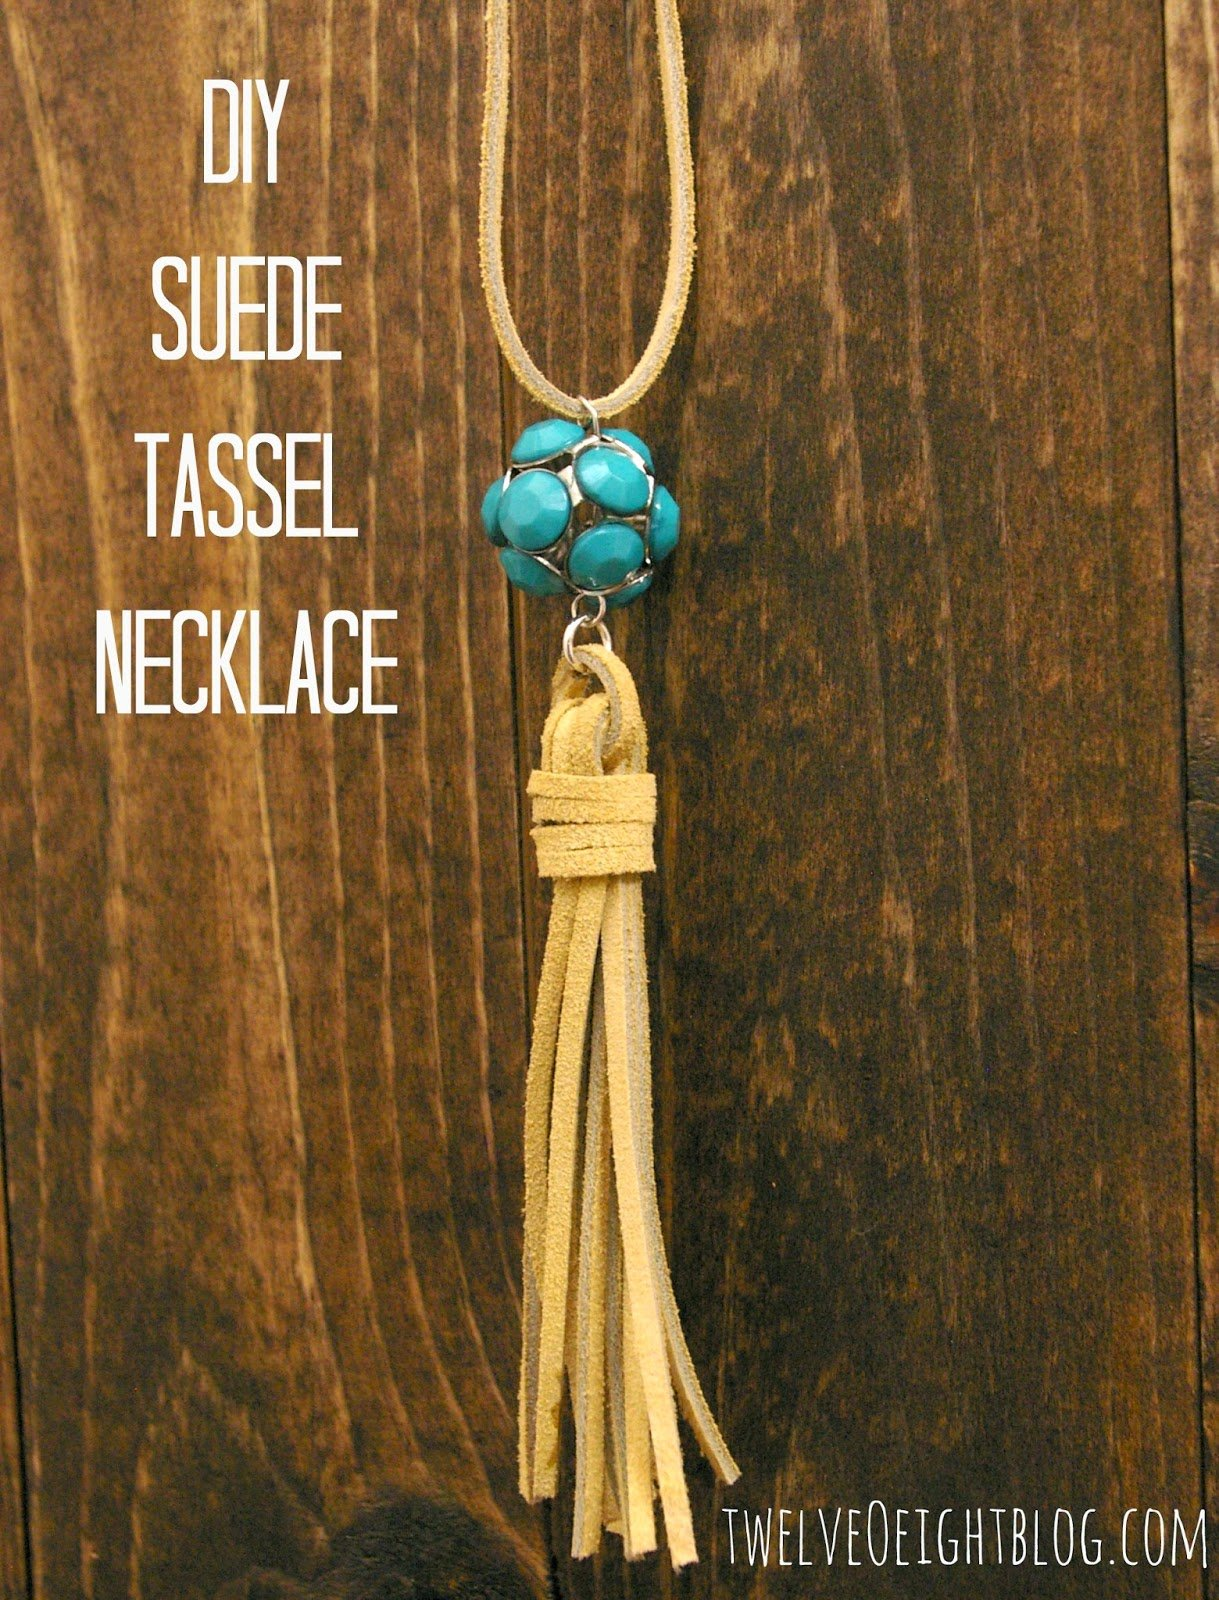 M&J Trimming - DIY Suede Tassel Necklace